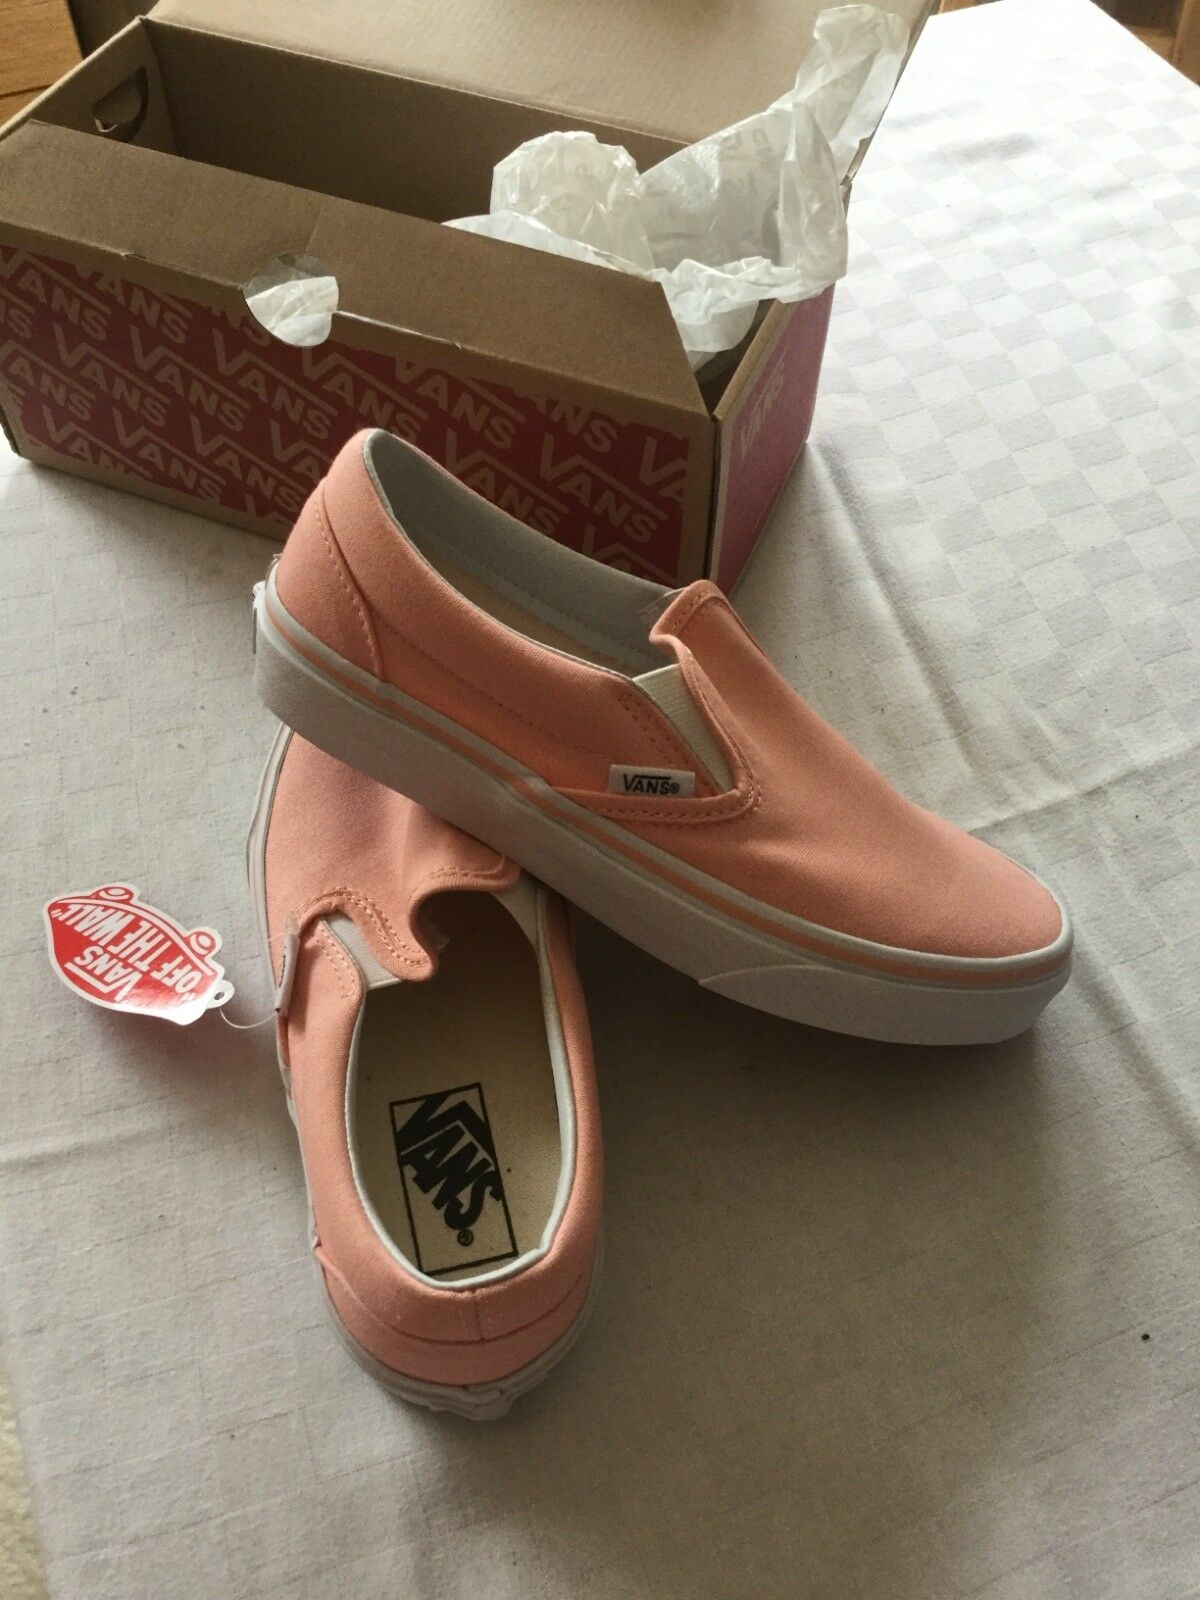 Vans classic slip on tropical peach true white Sneakers BNWB